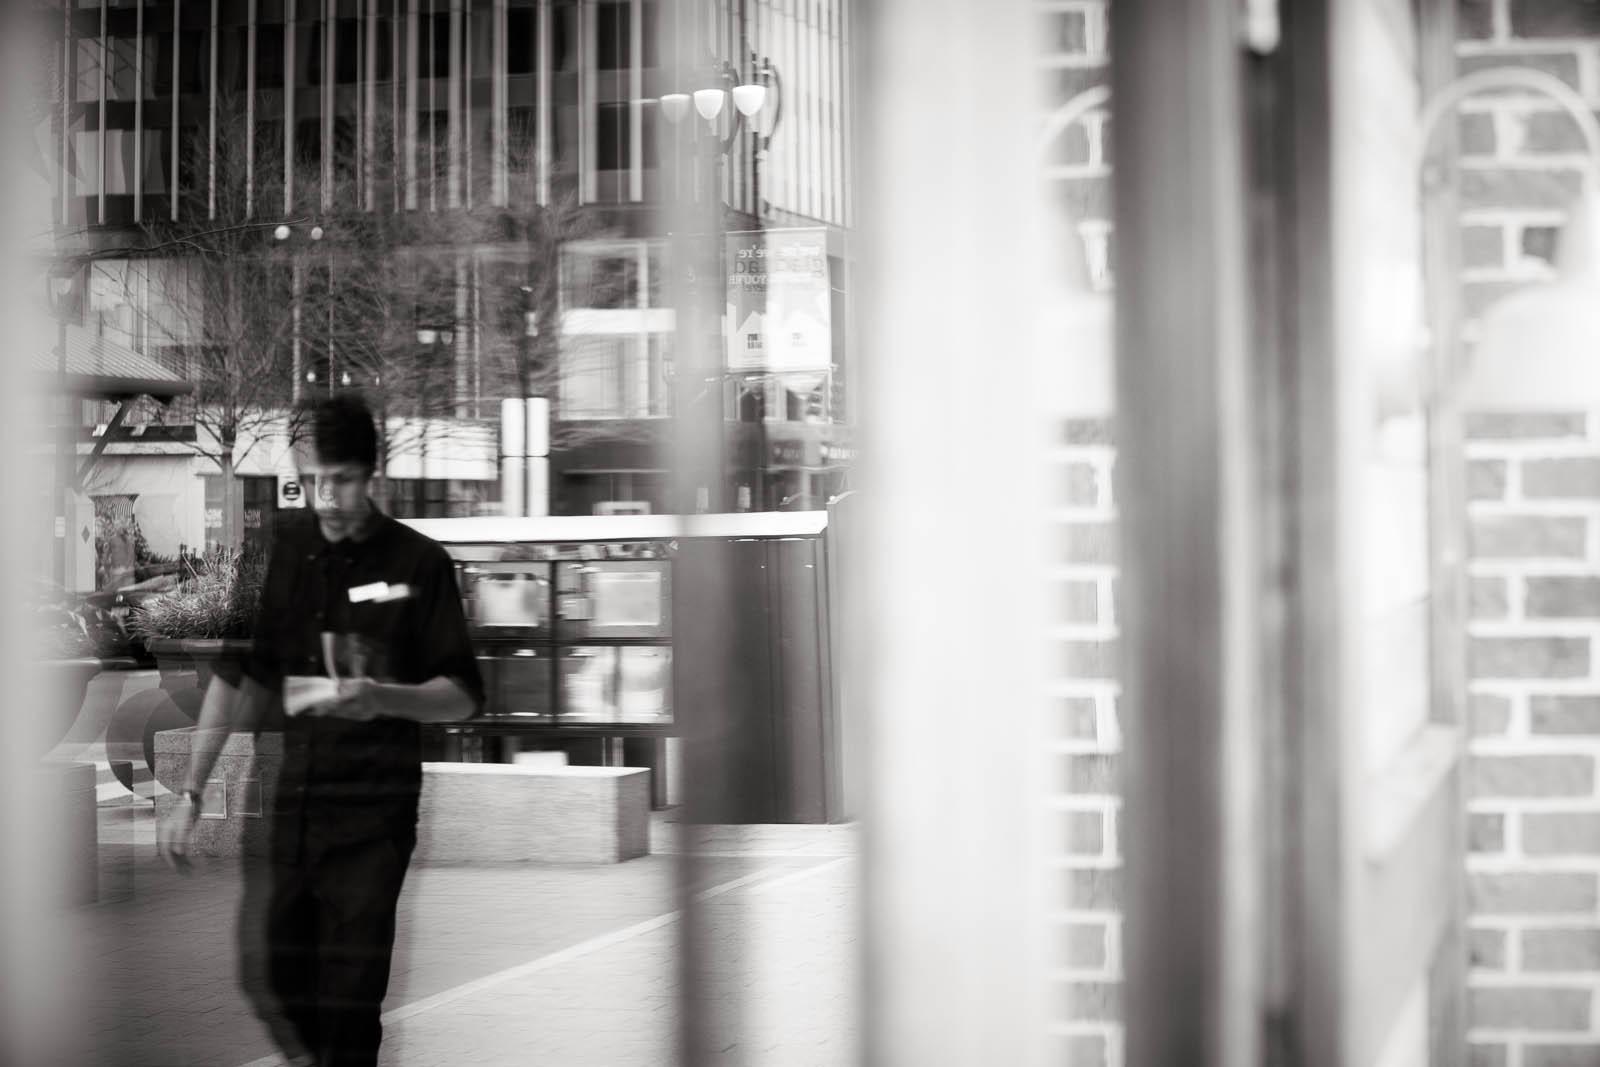 StreetPhotography_DownTownRaleighNC_ErnestoSue-2493.jpg